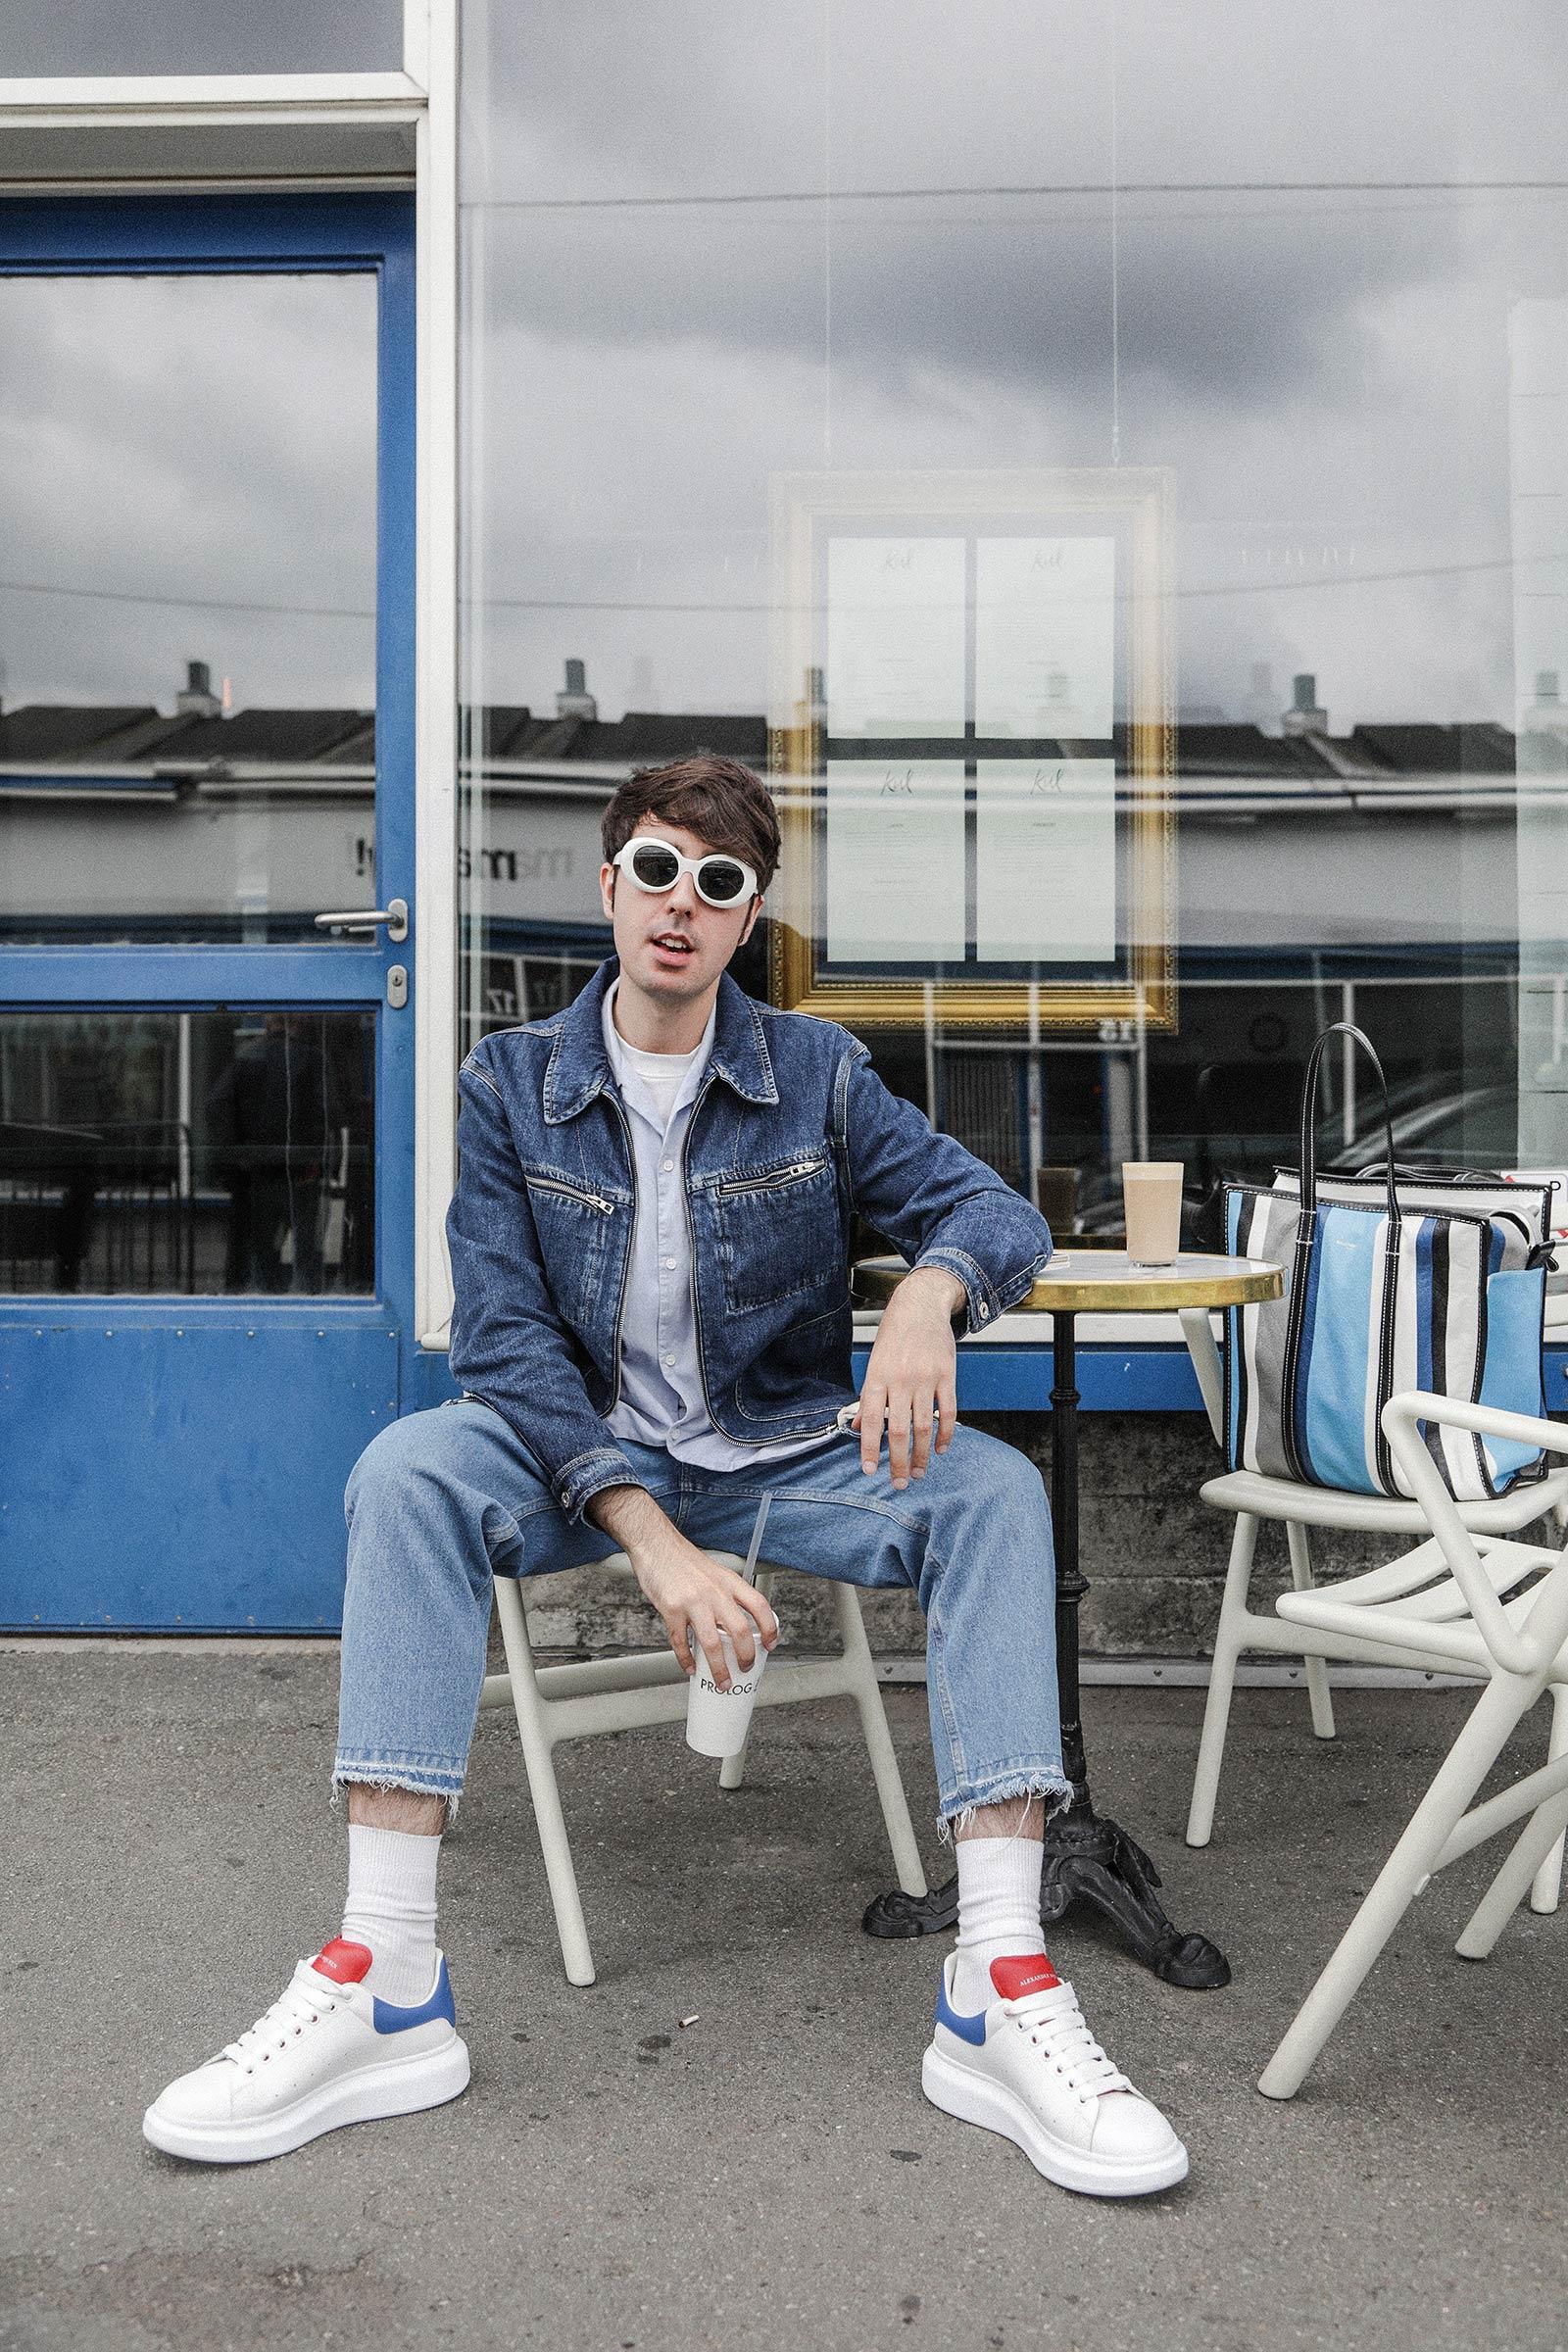 cupofcouple-acne_jacket-acne_sunglasses-loewe_jacket-balenciaga_bag-0007